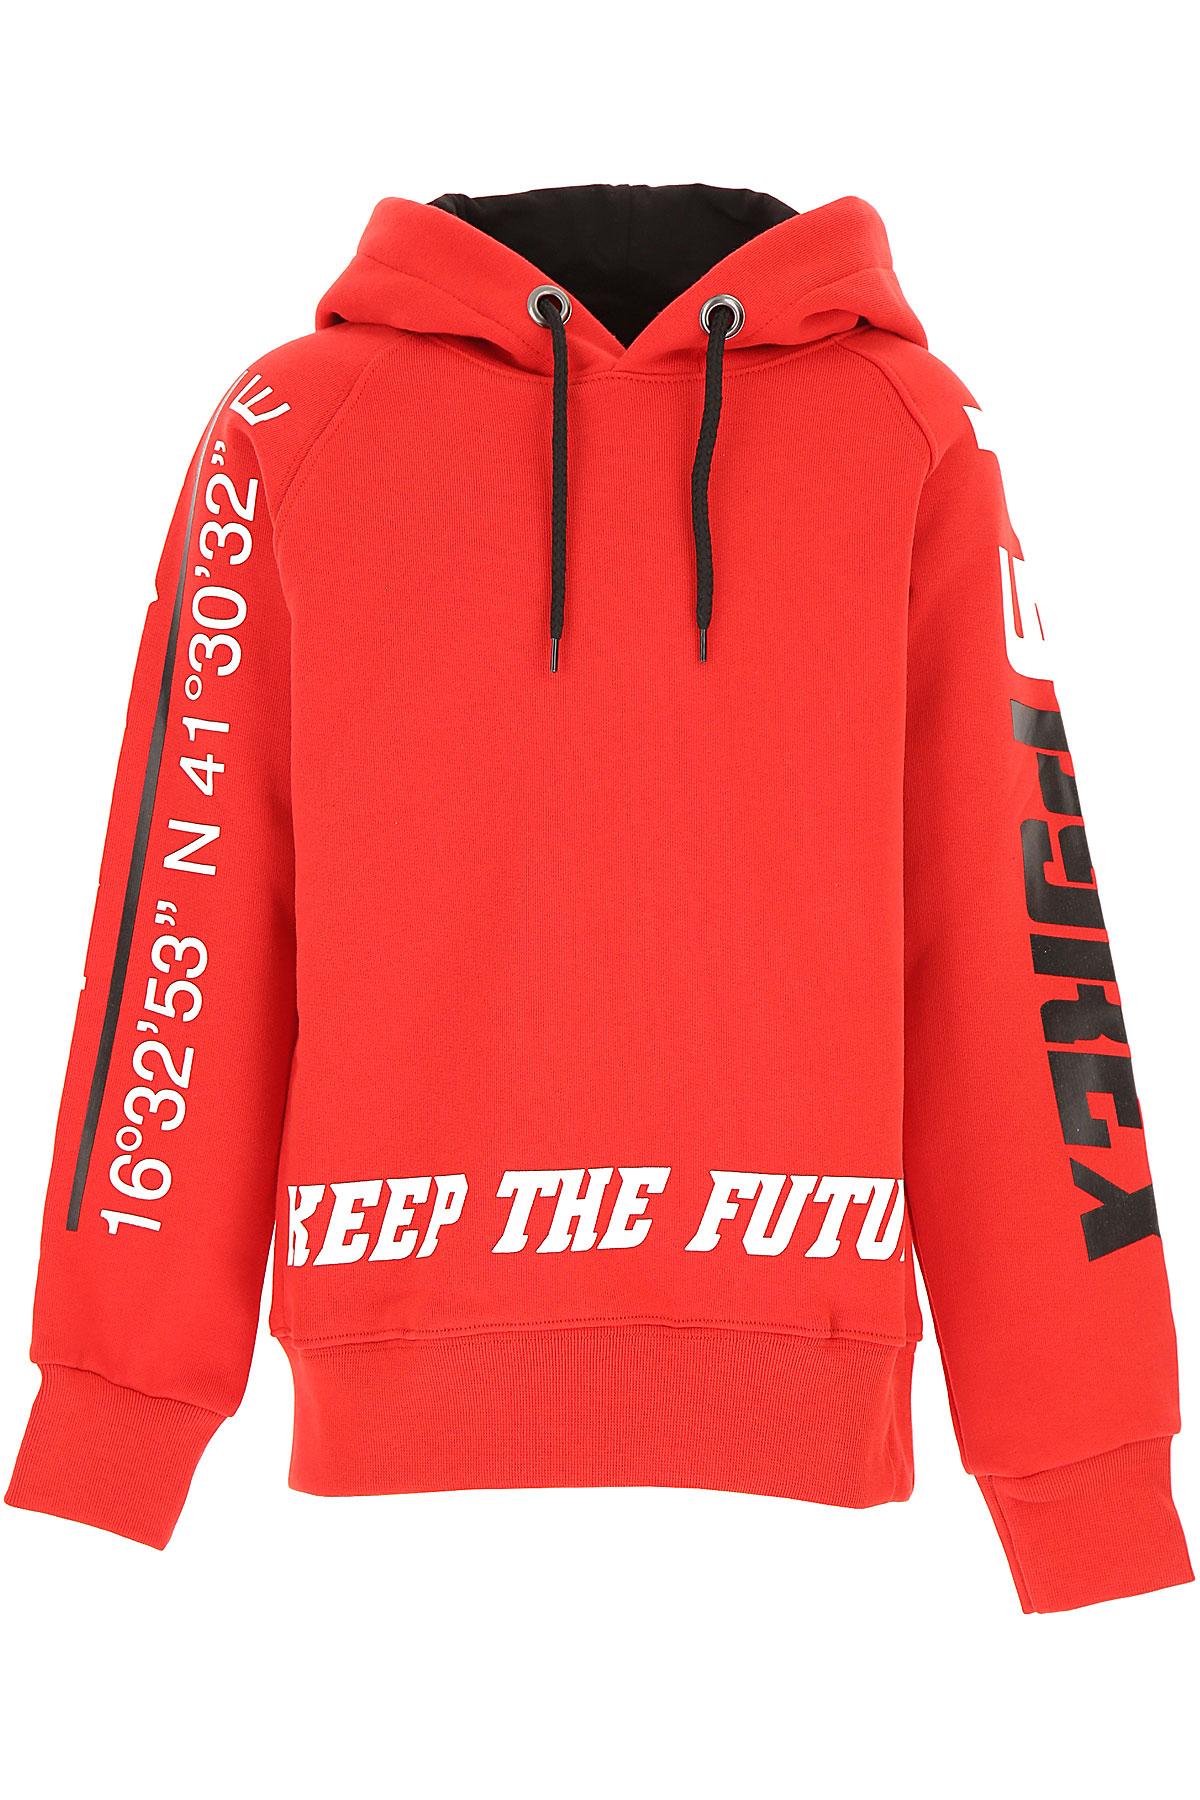 Pyrex Kids Sweatshirts & Hoodies for Boys On Sale, Red, Cotton, 2019, M S XL XS